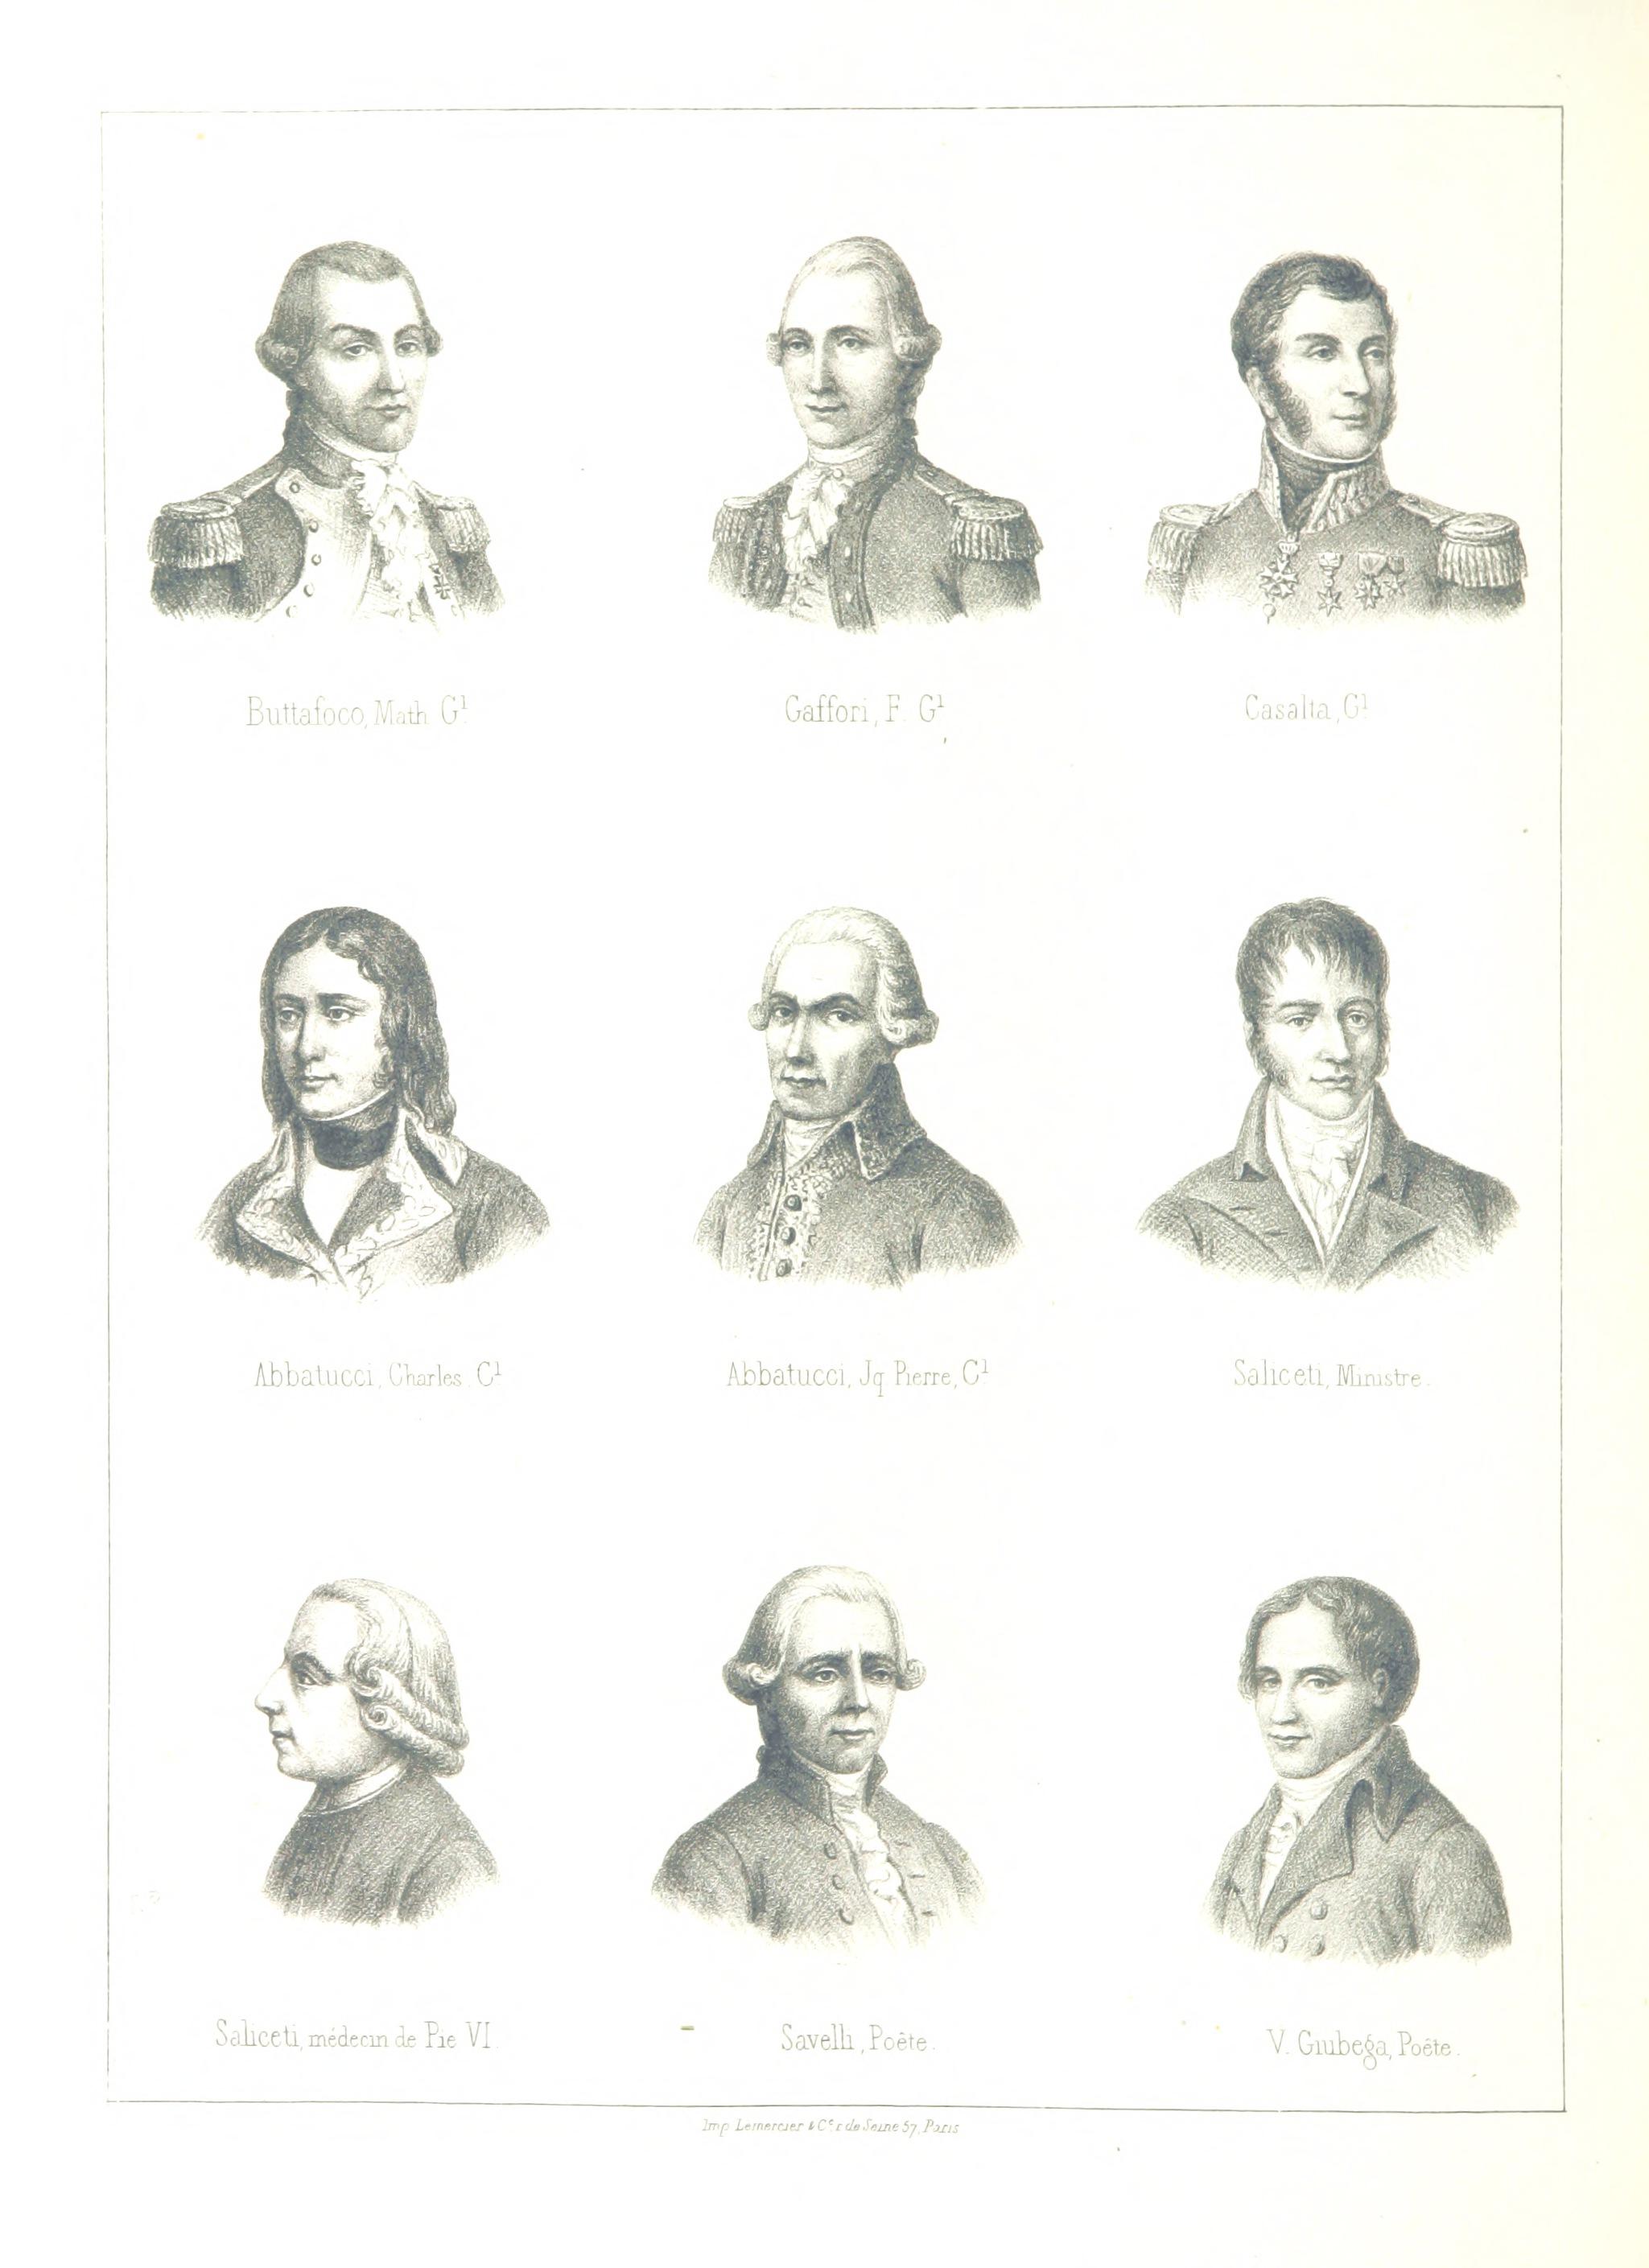 File:Image-taken-from-page-626-of-histoire-illustree-de-la-corse